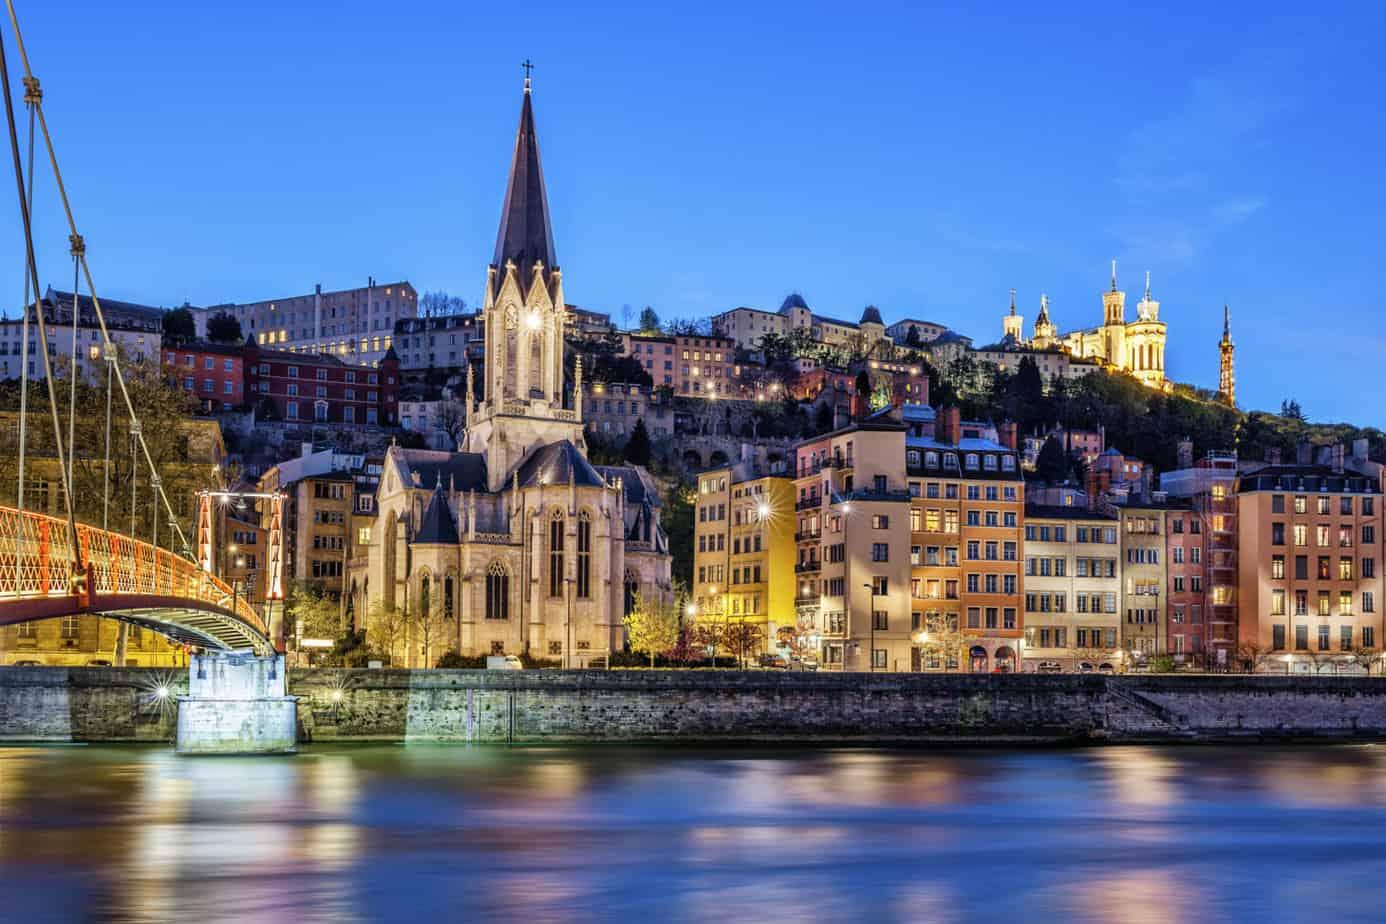 De kathedraal van Lyon